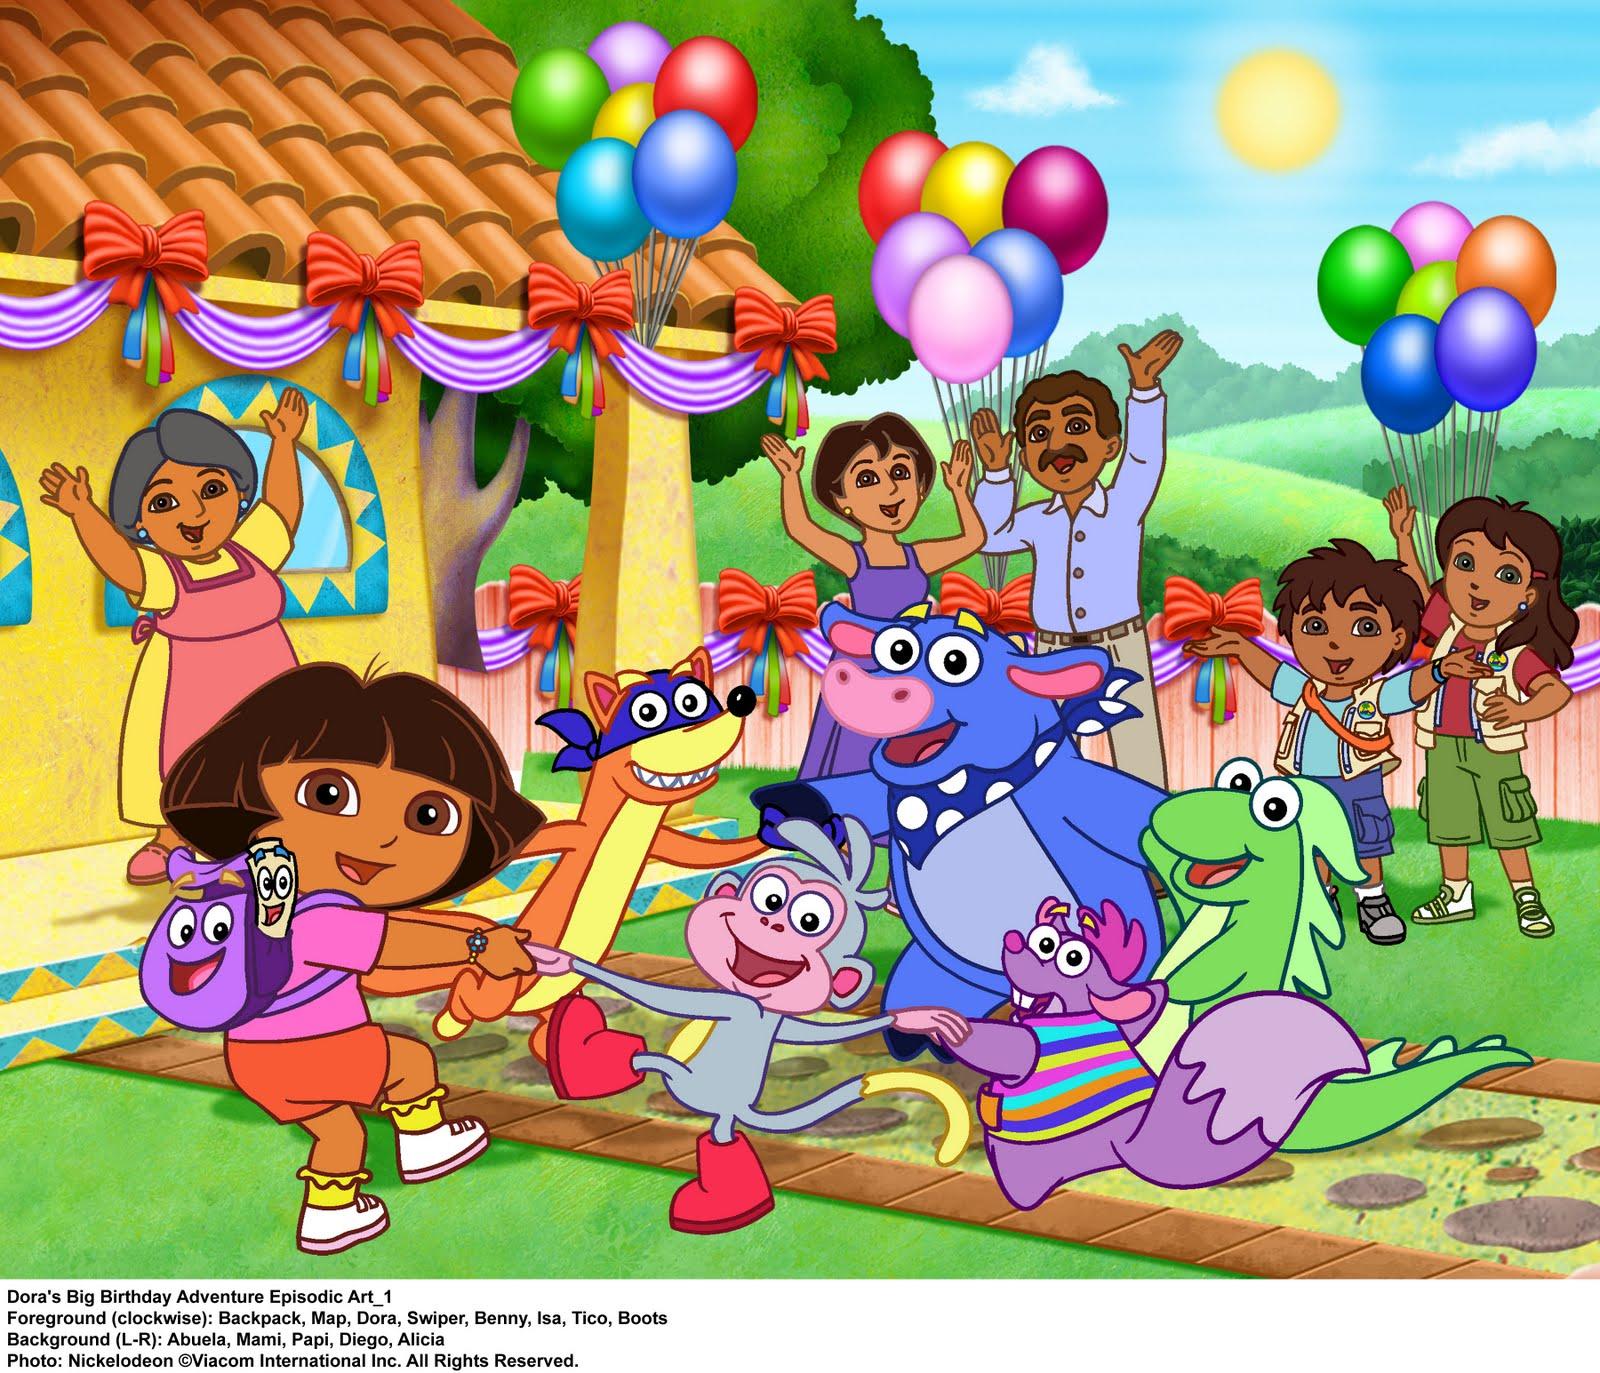 Dora The Explorer Decorations Ideas